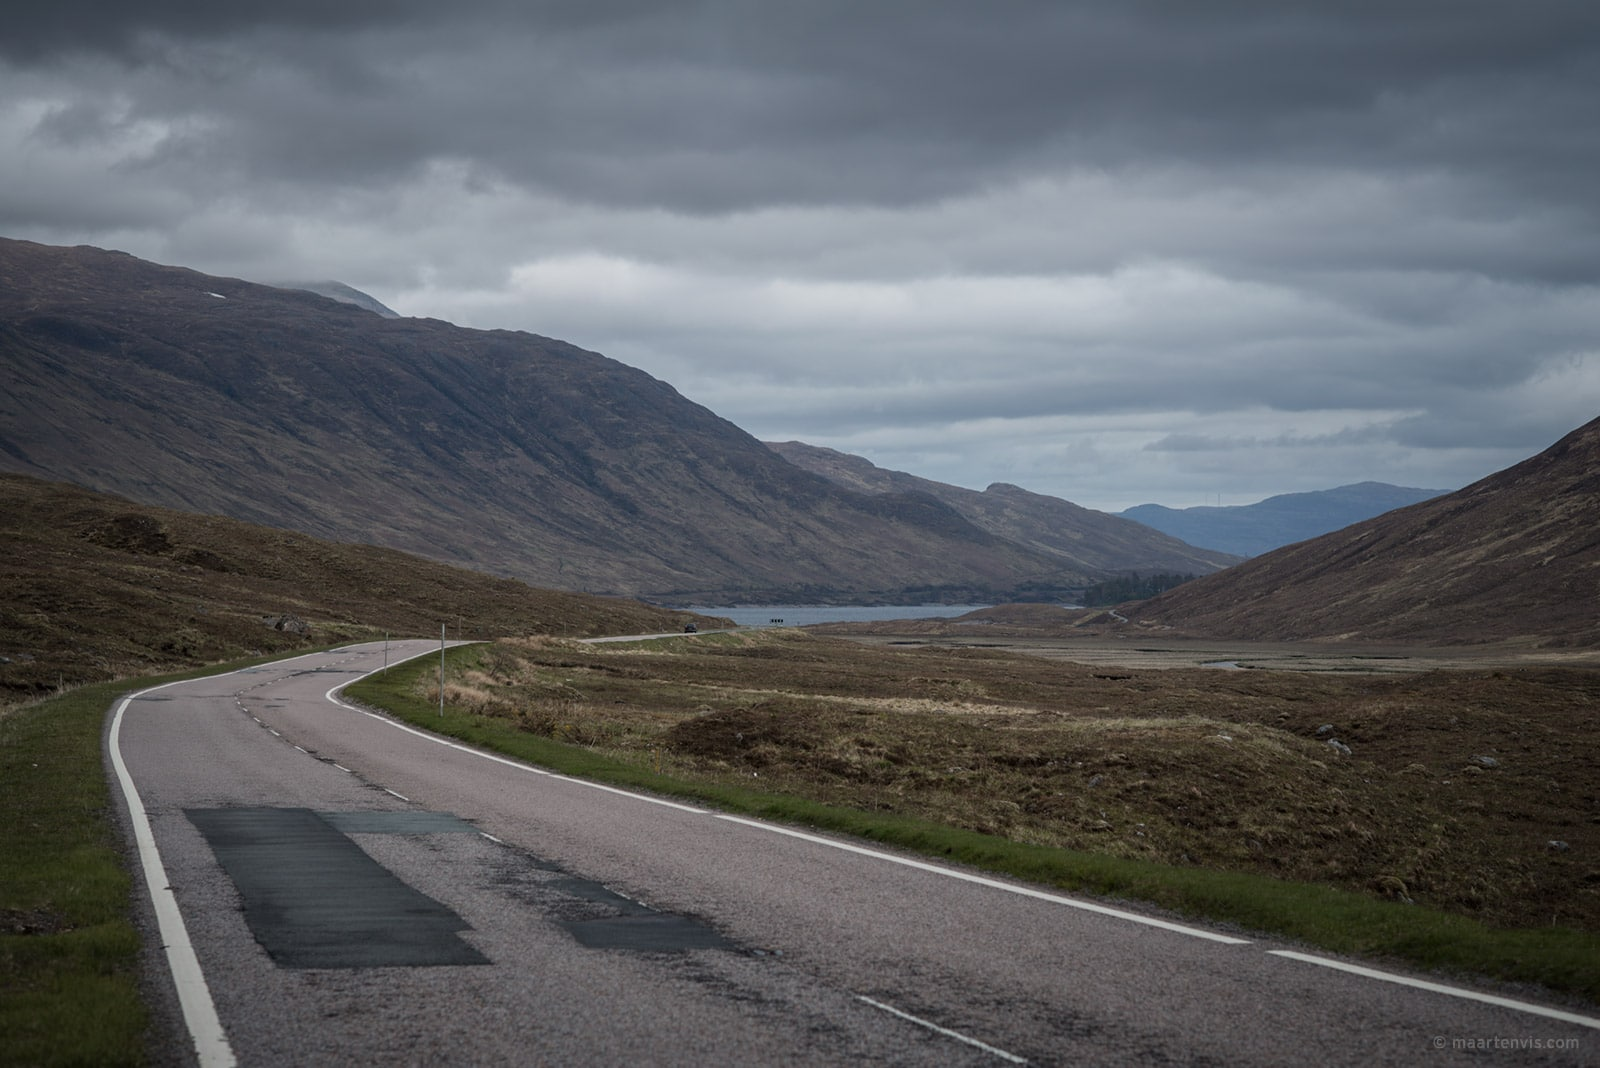 20150519 8125 - Driving to Eilean Donan Castle